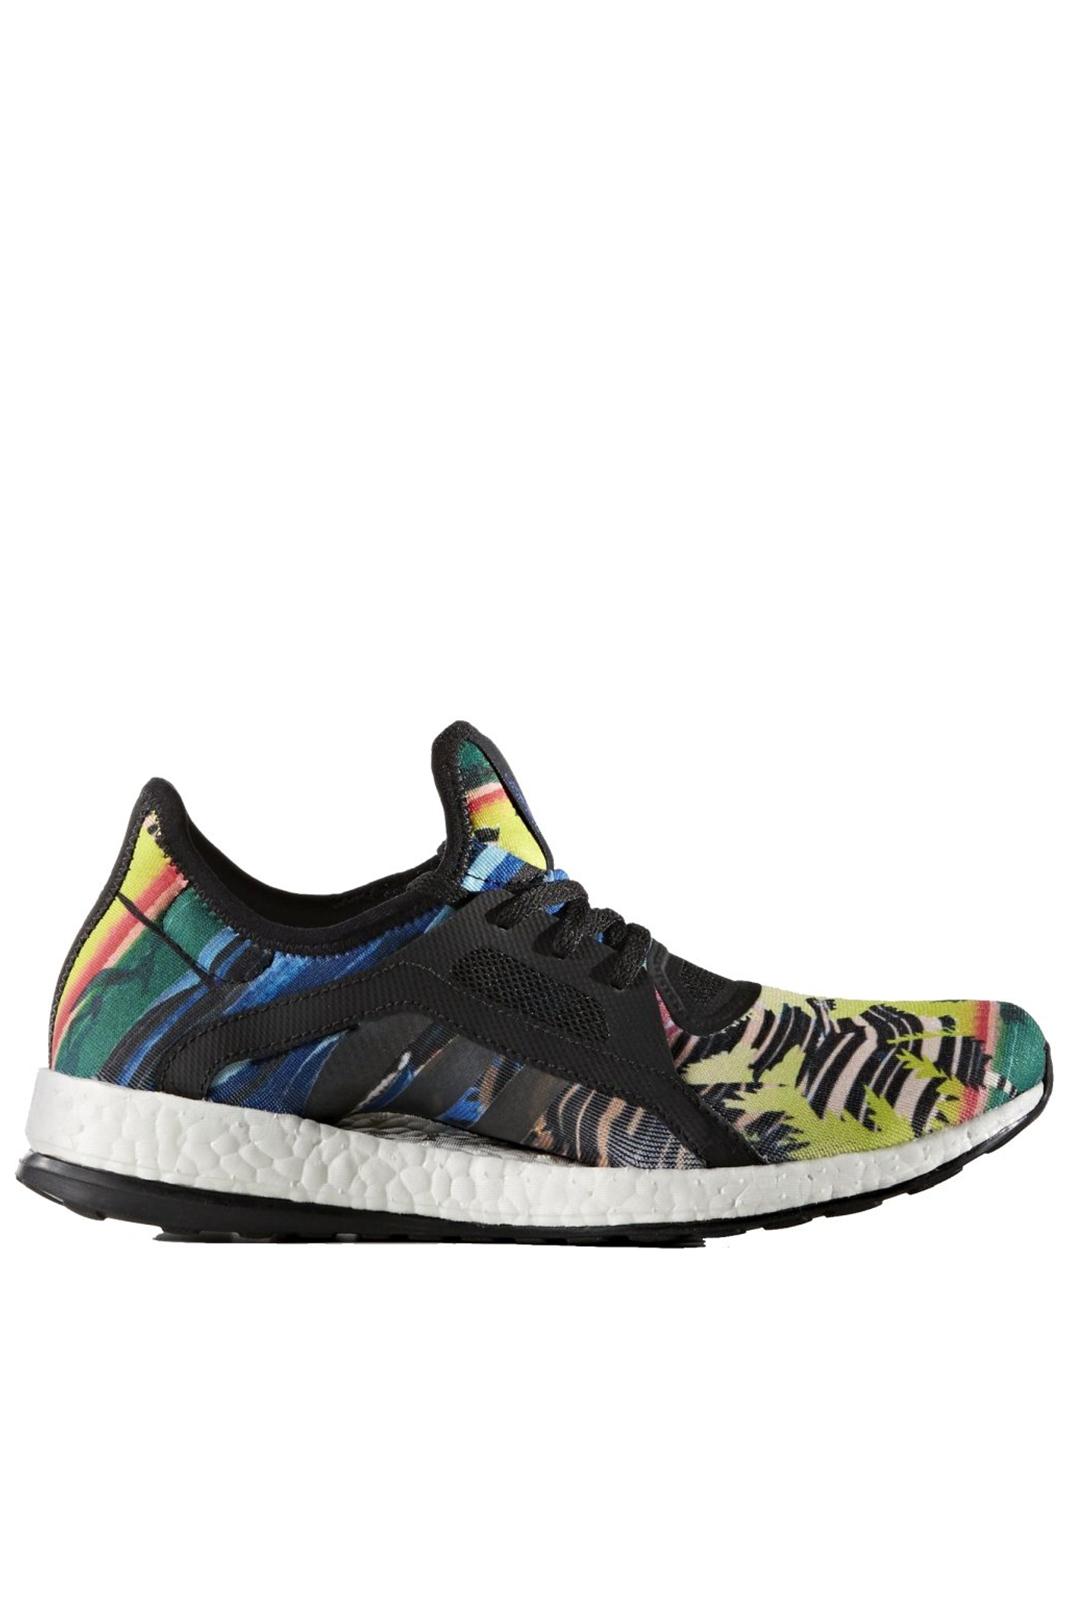 Baskets / Sneakers  Adidas BB4018 PUREBOOST X MULTI